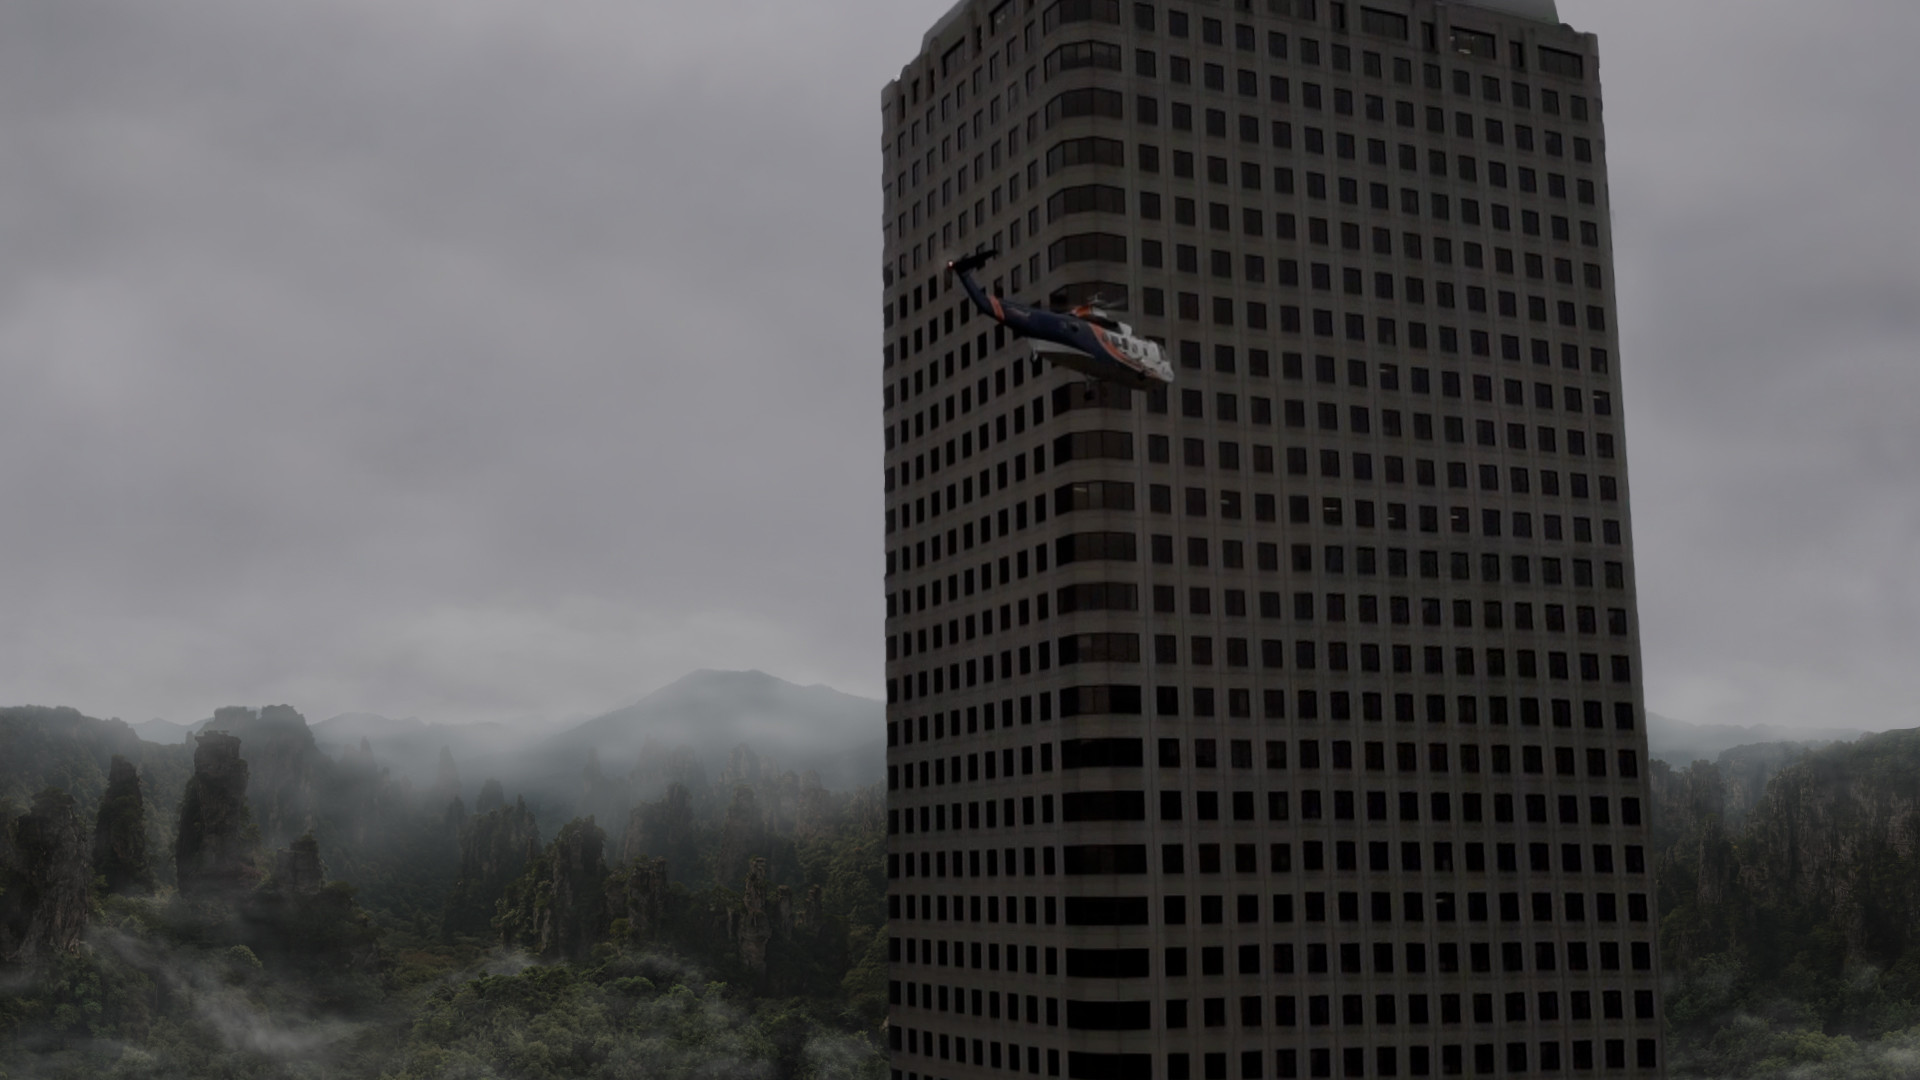 Tamas csordas helicopter